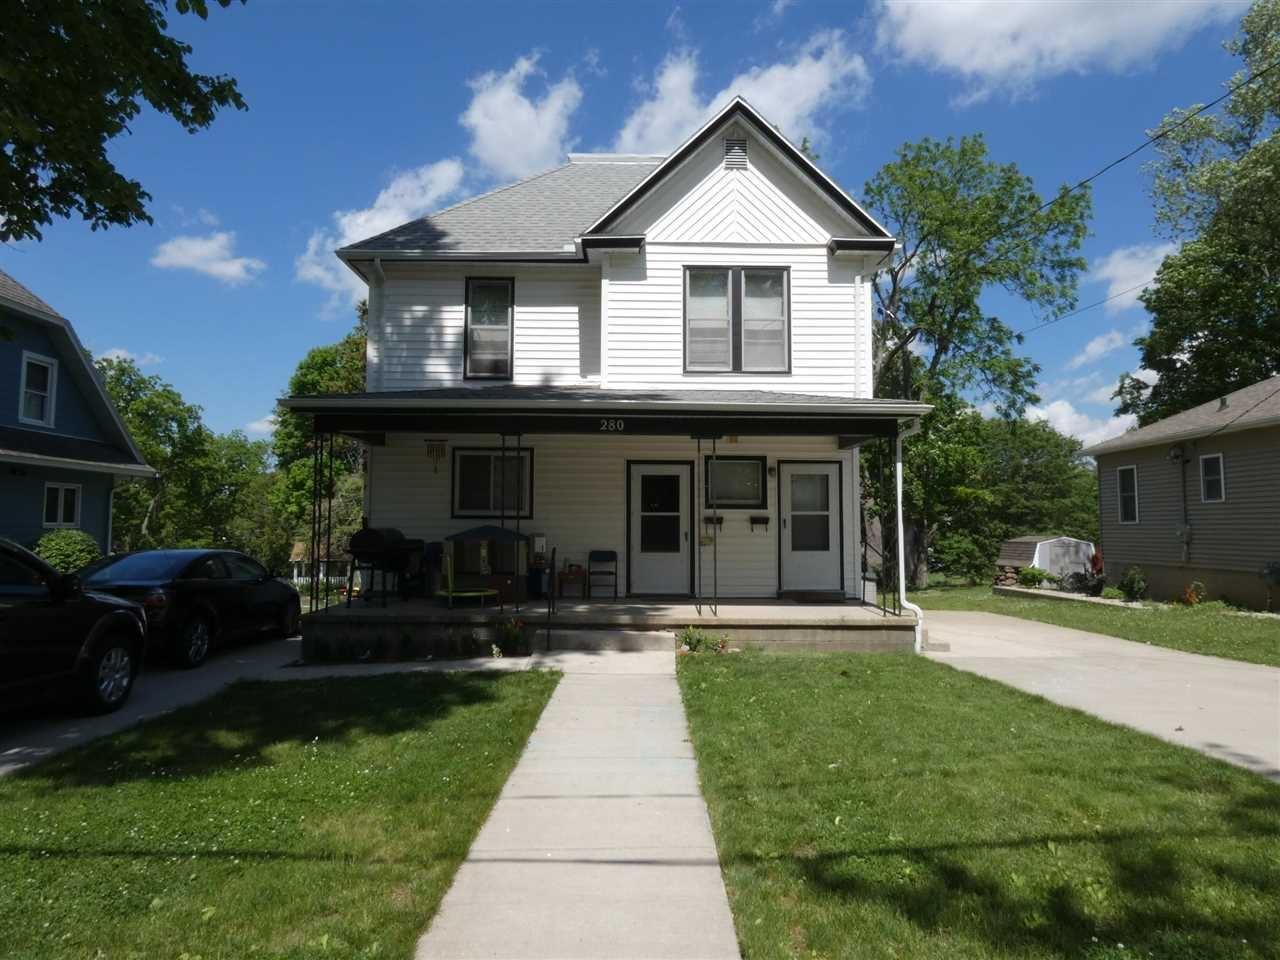 280 Lutheran St, Platteville, WI 53818 - #: 1911619